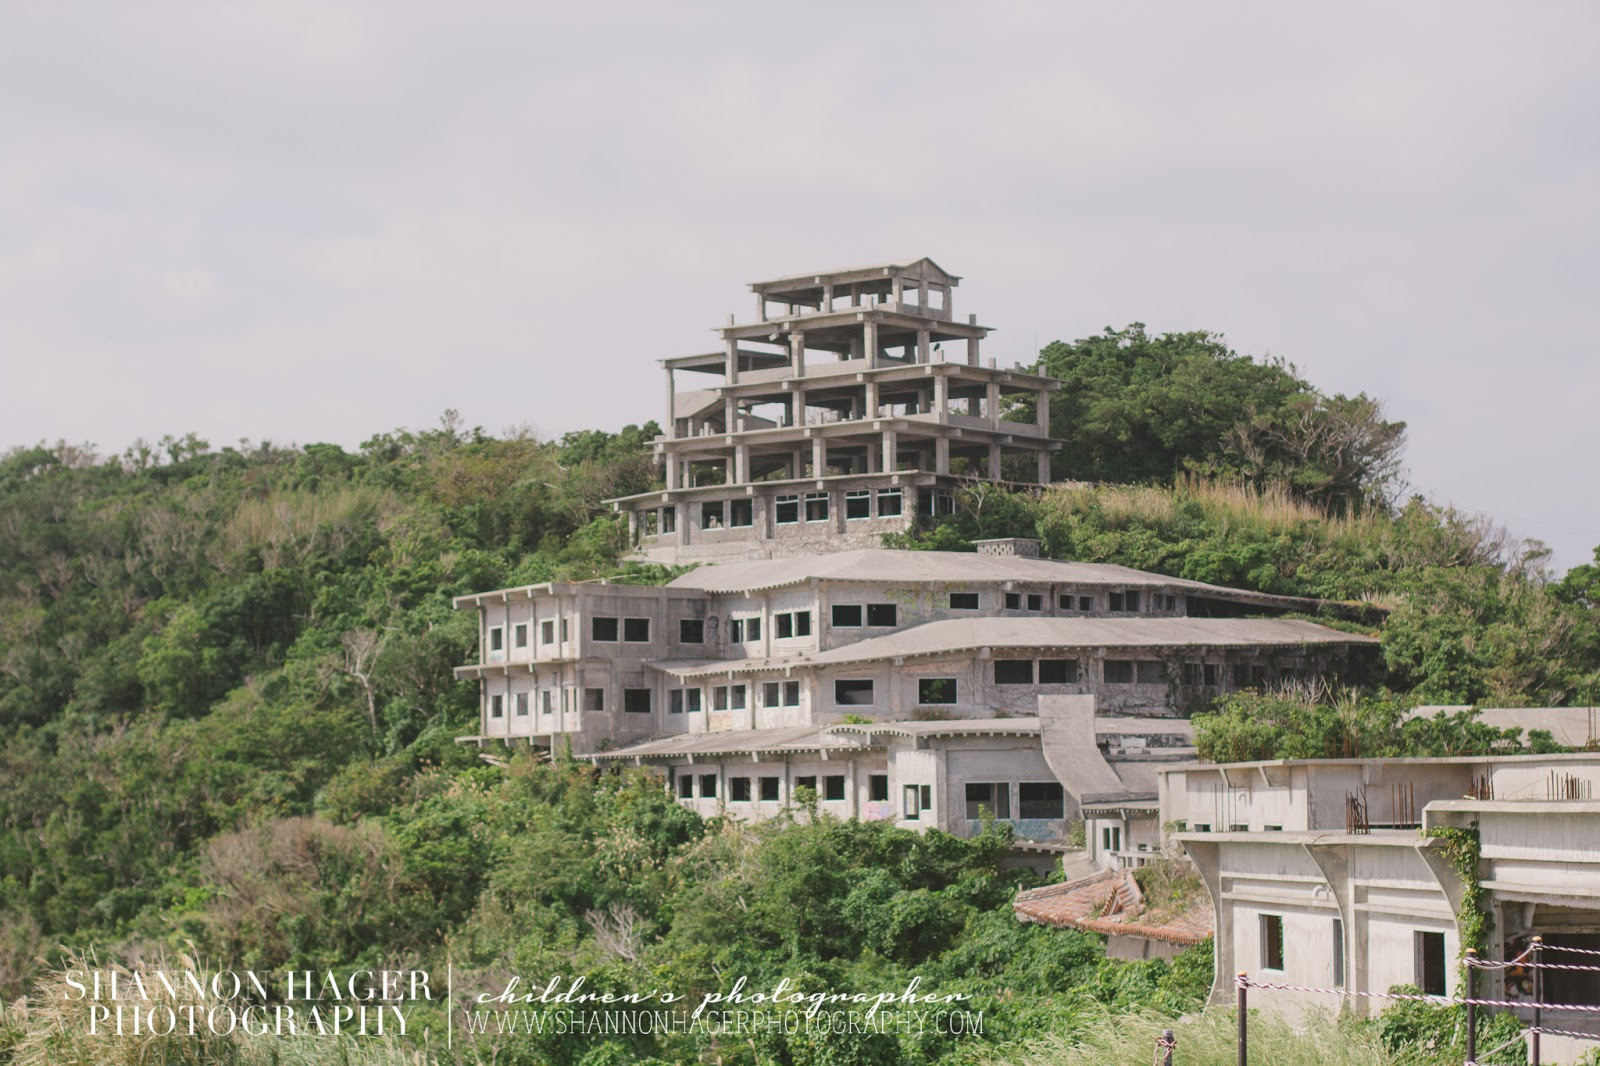 Abandoned Hotel Okinawa by Shannon Hager Photography, Portland Photographer